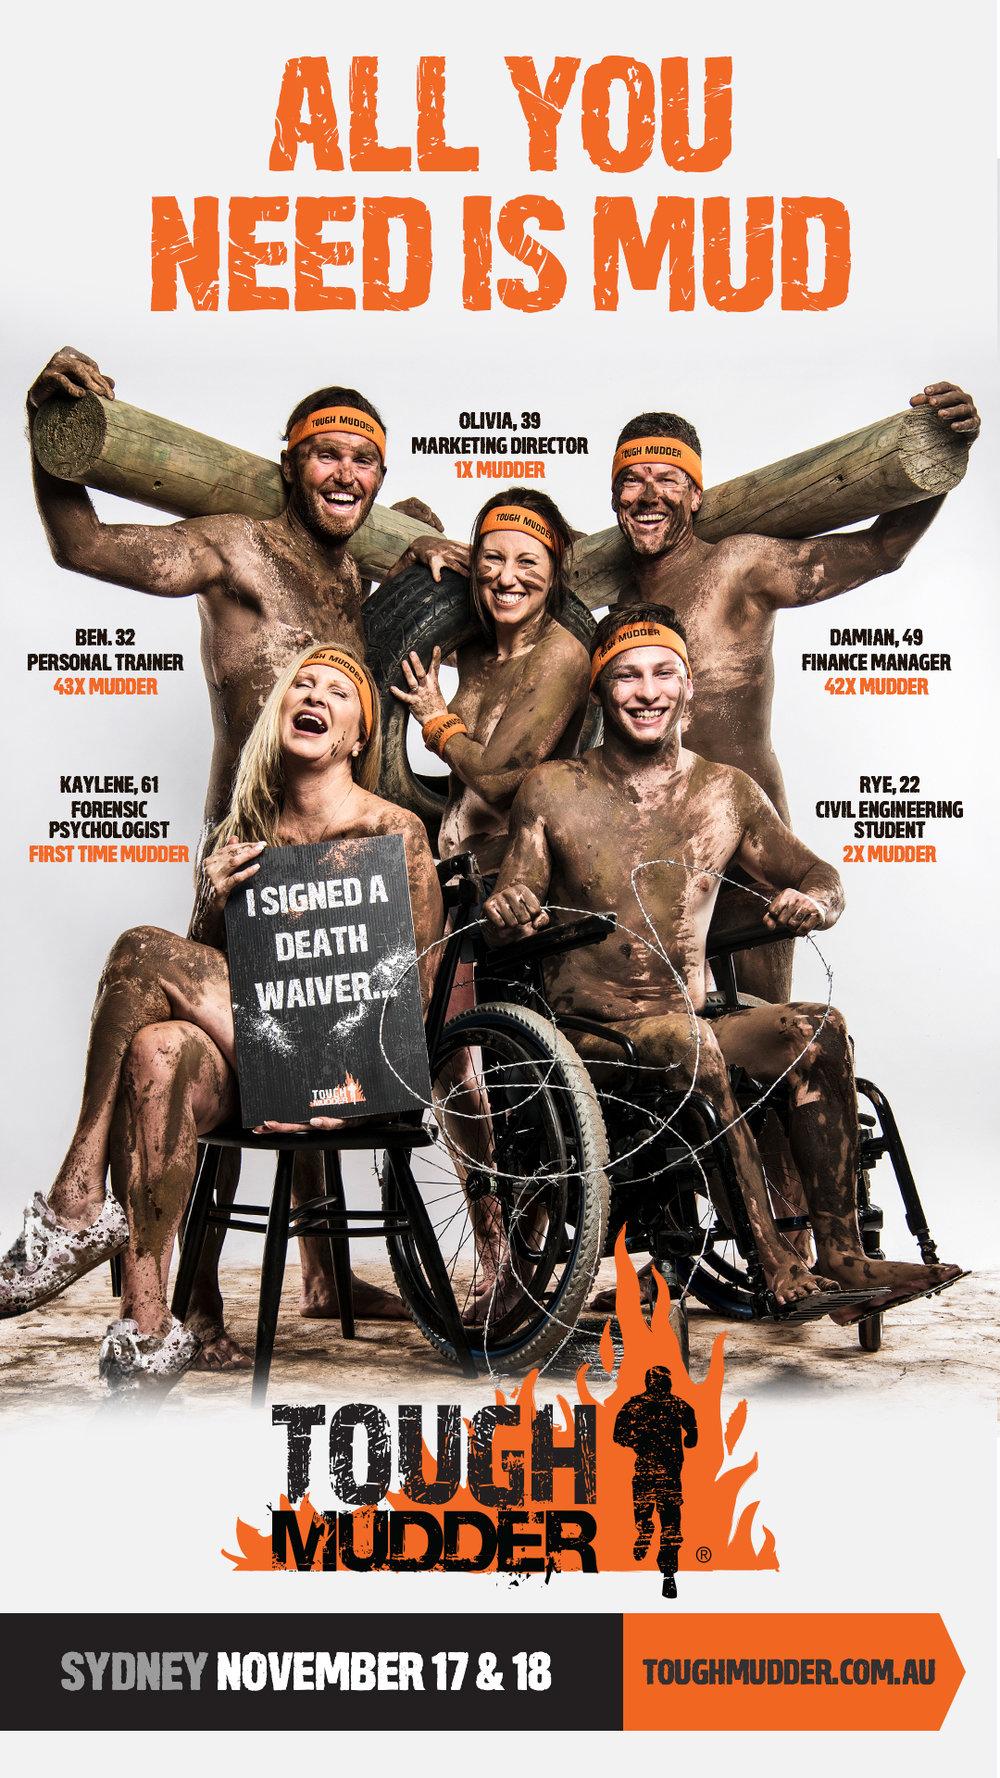 Tough-Mudder-Campaign-Ad-Sydney-2